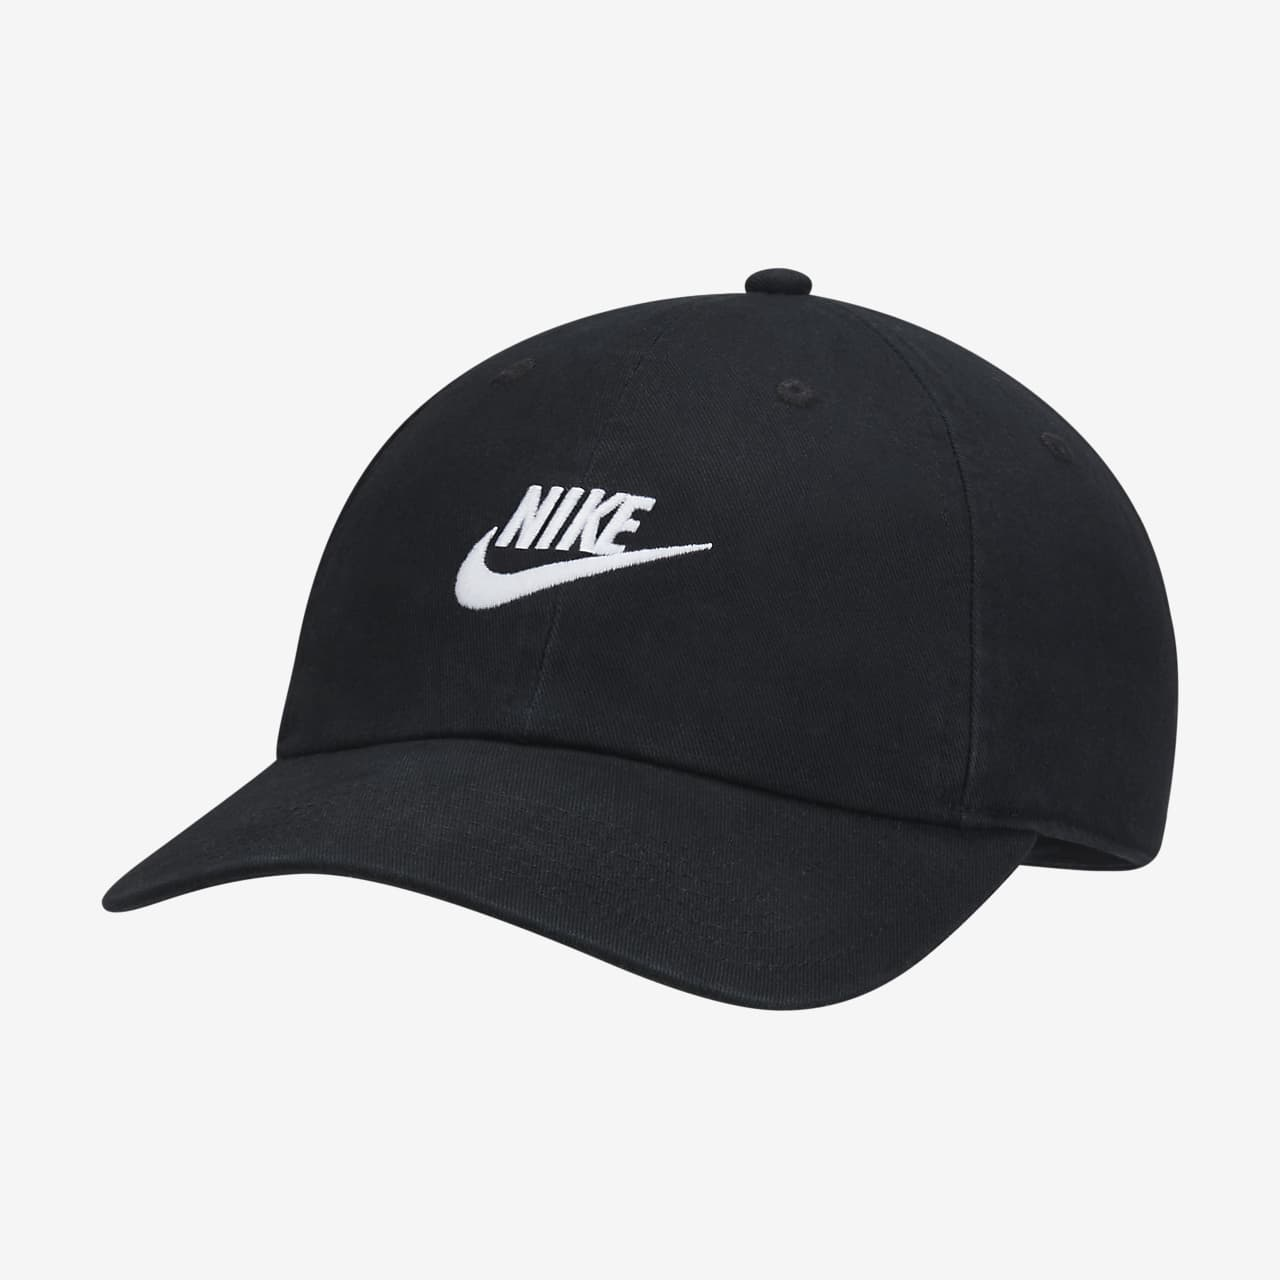 d8b721d54ceb Nike Sportswear Heritage86 Futura Washed Hat. Nike.com BE